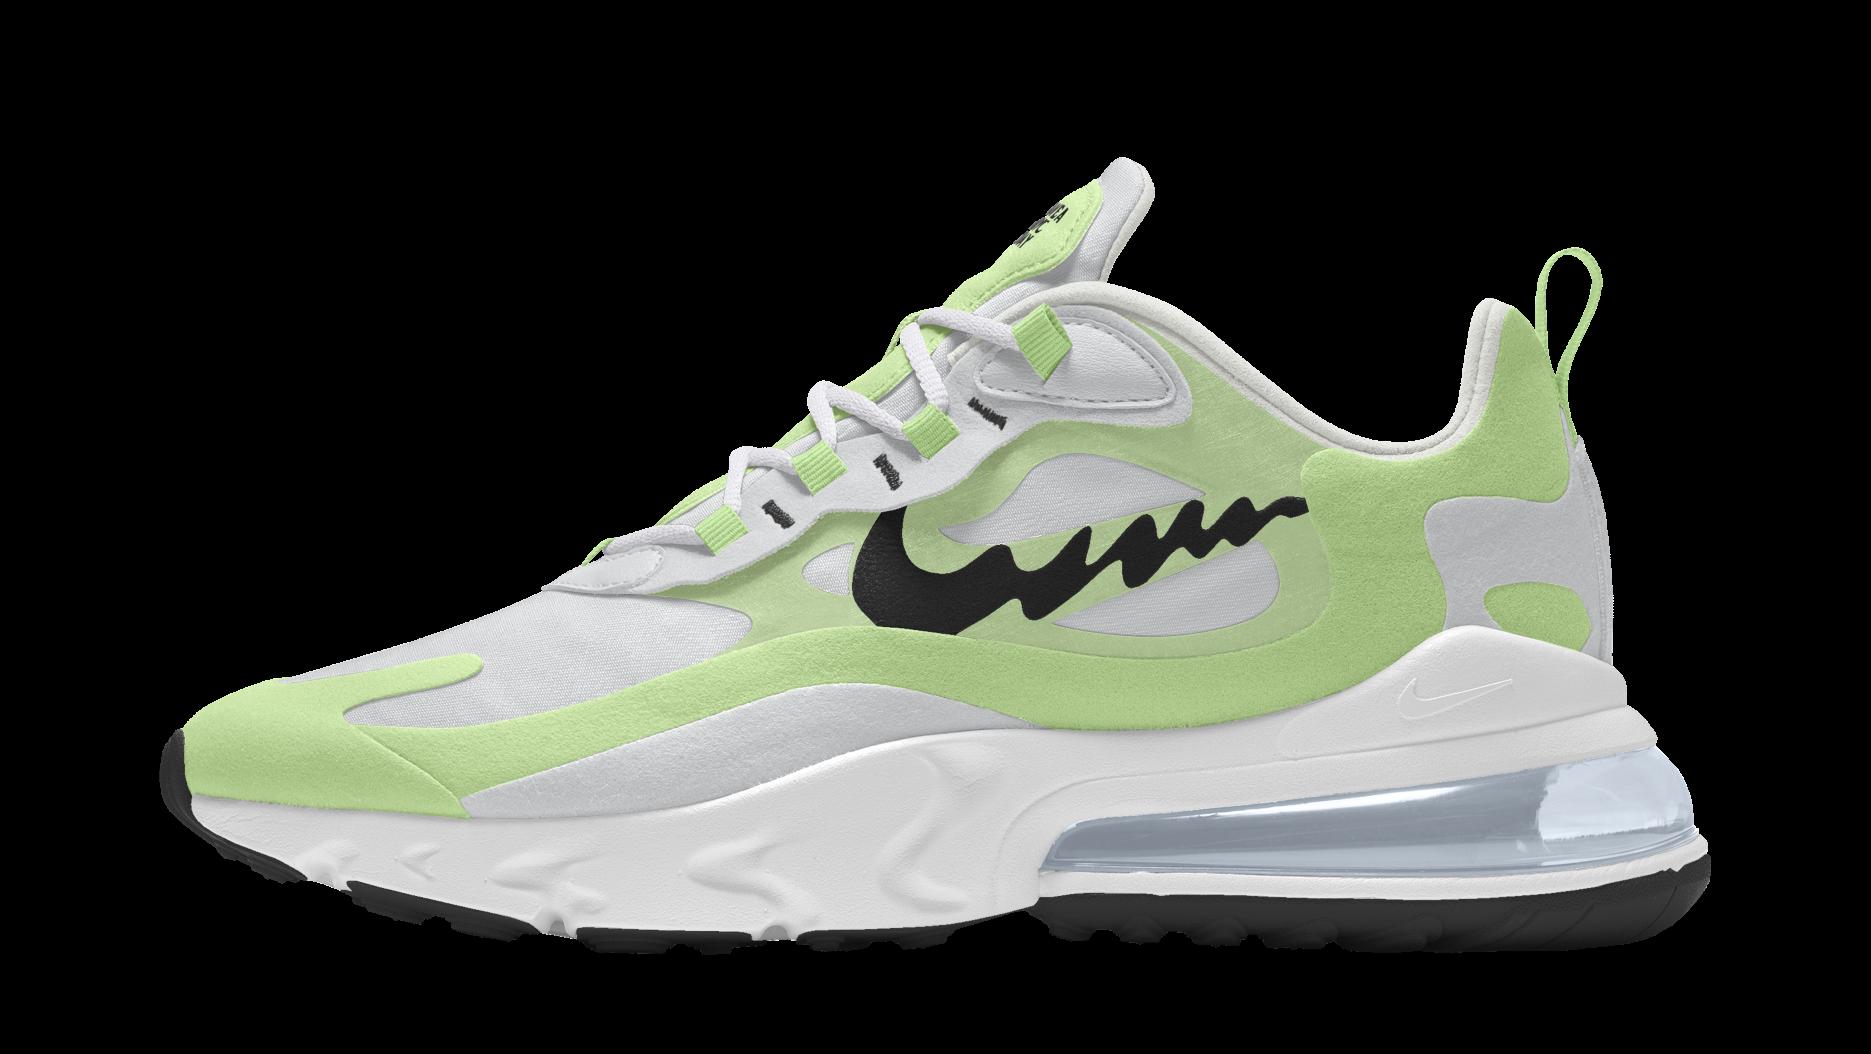 Nike Air Max 'In My Feels' Shoe Release Raises Mental Health ...